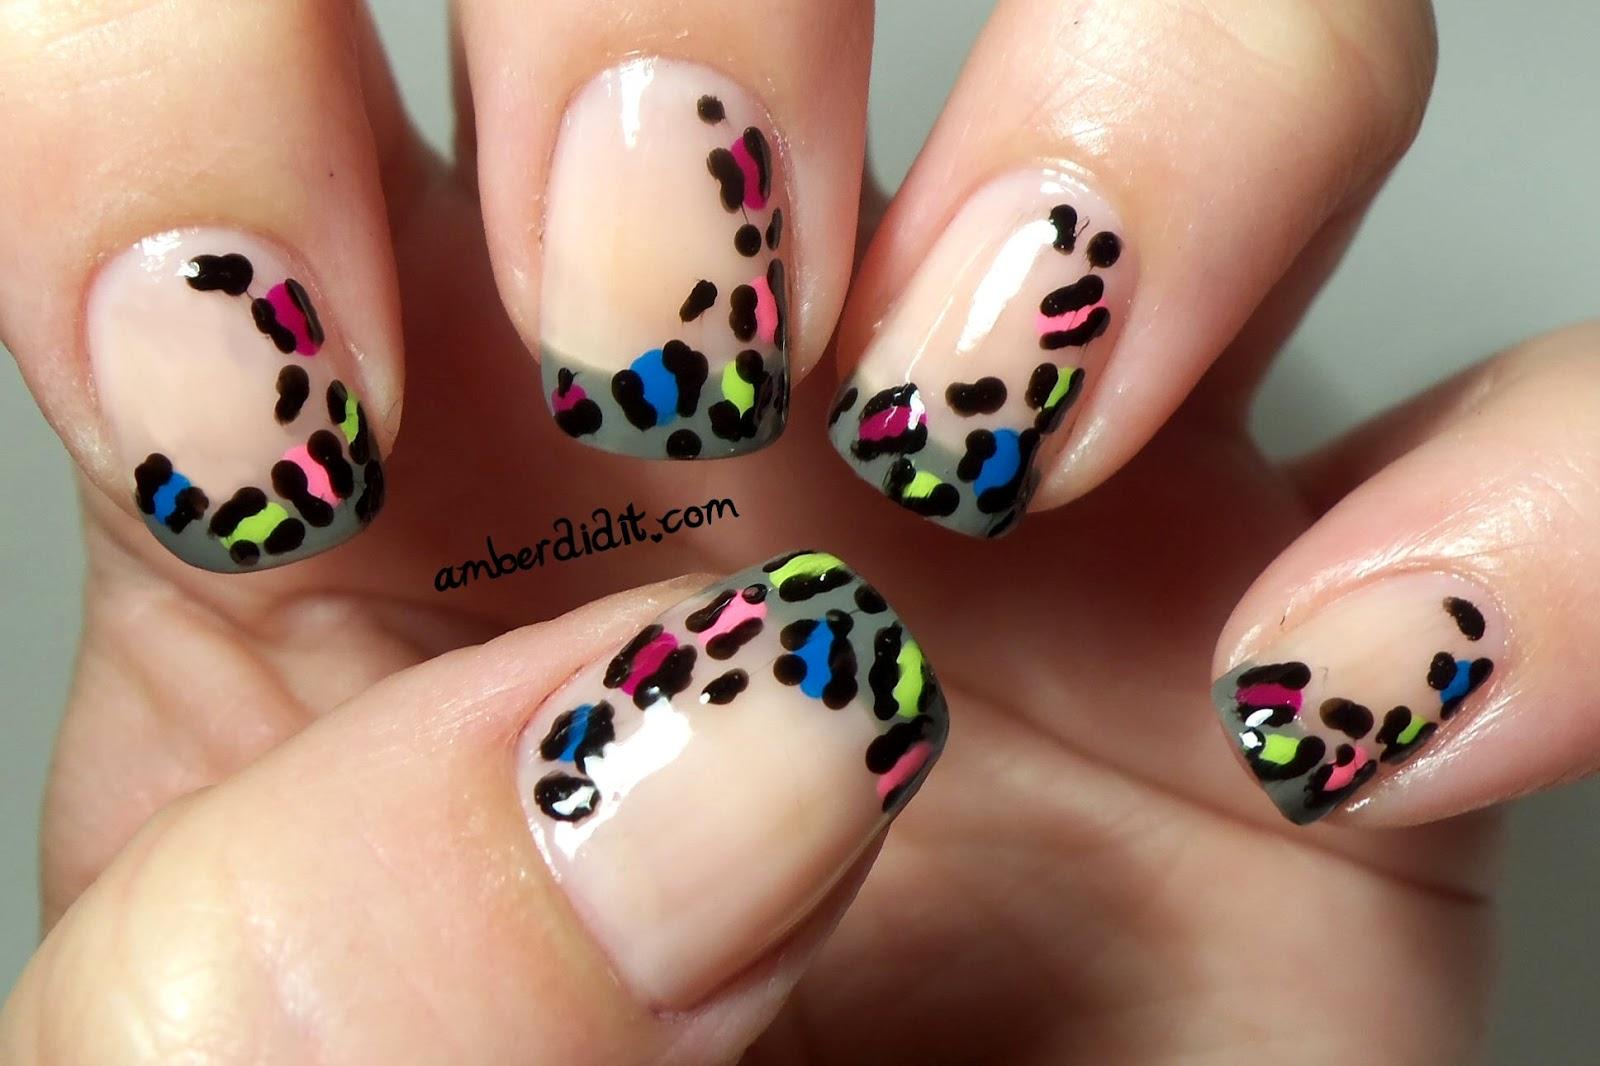 Cheetah French Tip Nail Designs